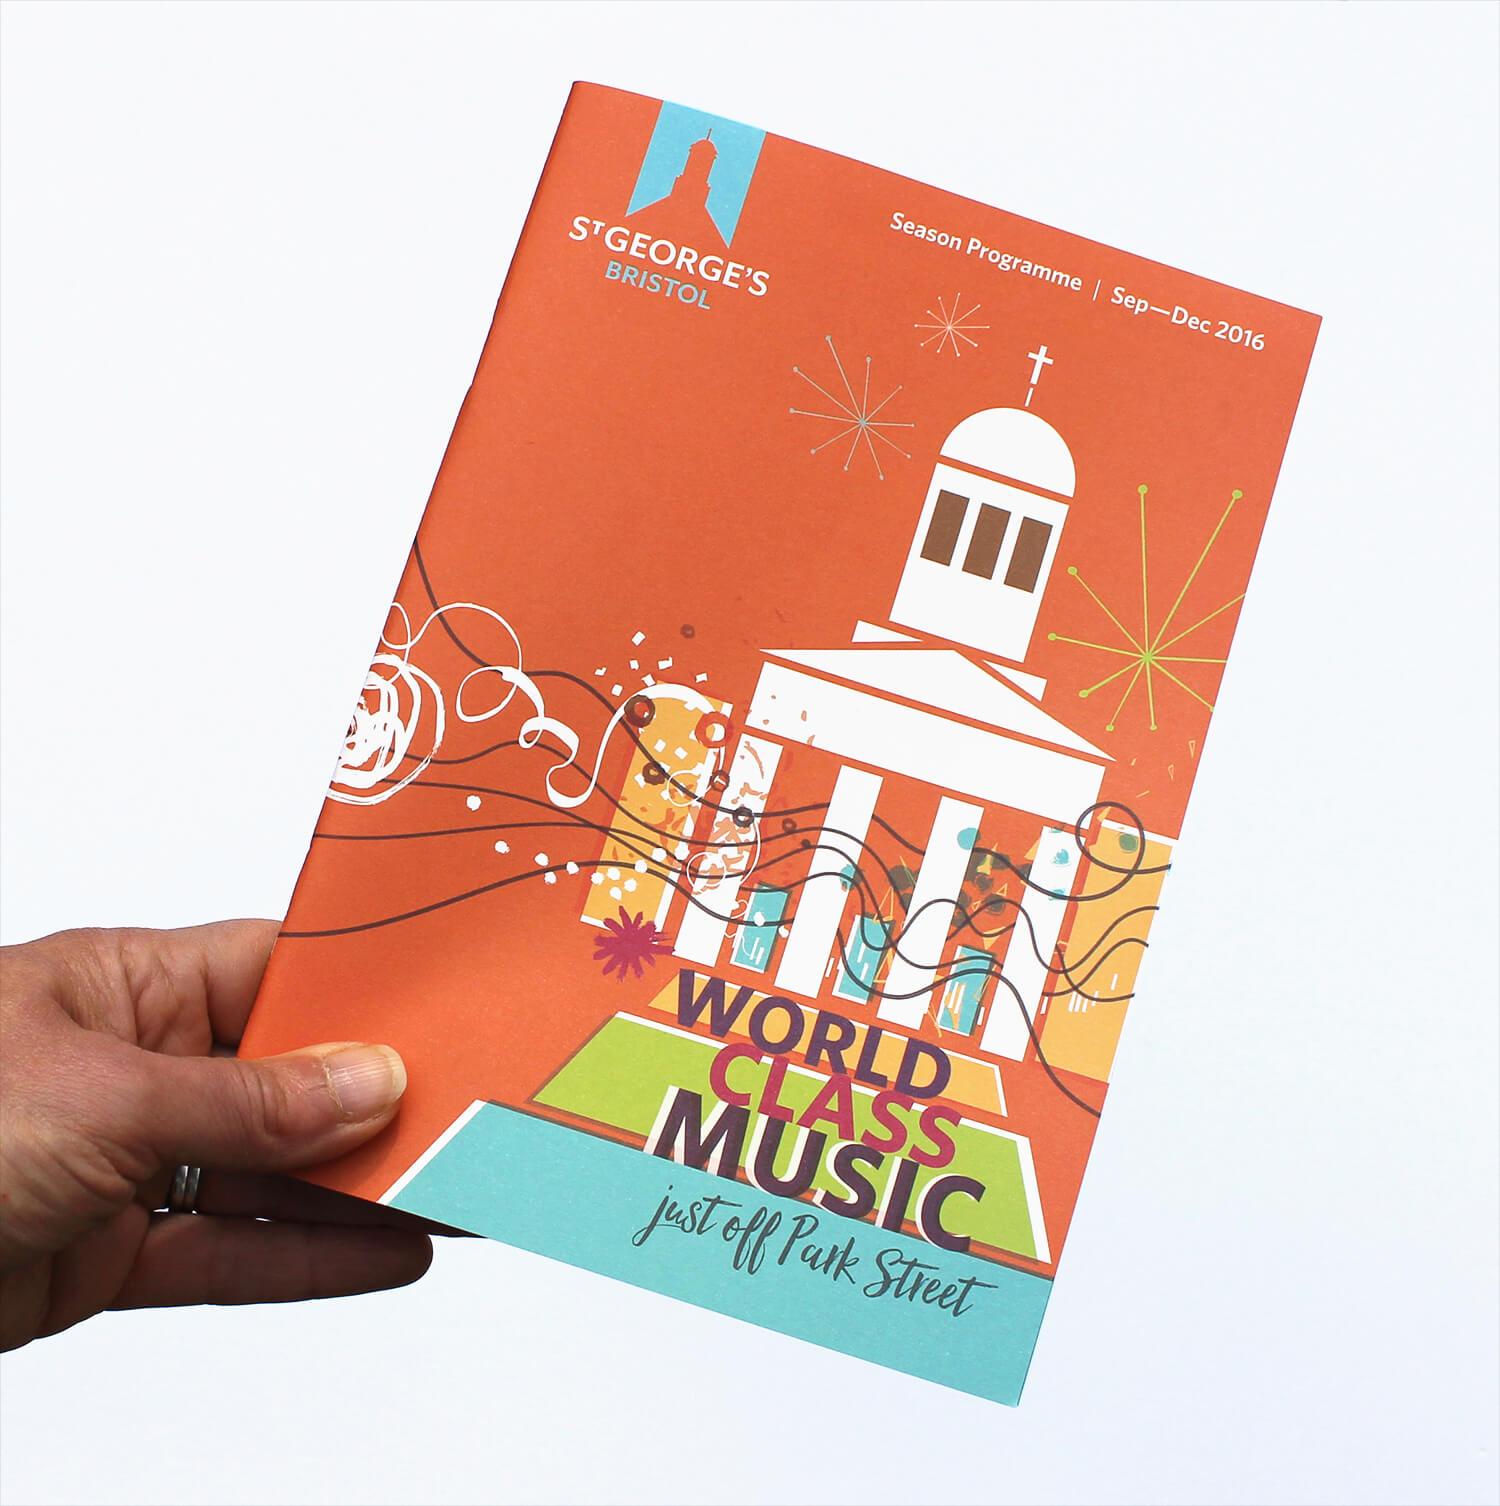 Season Programme Cover